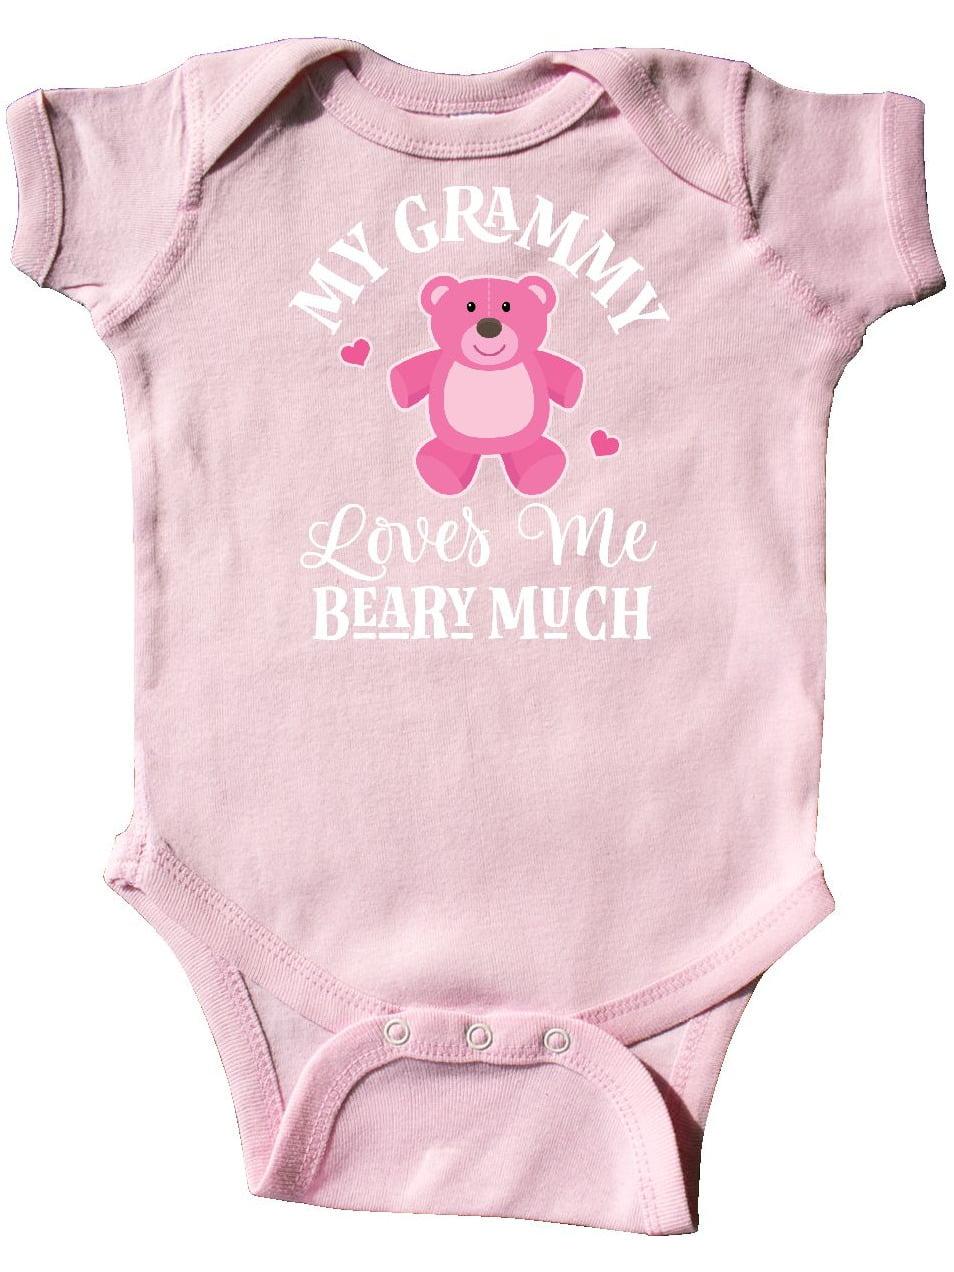 Cute Bear Long Sleeve Creeper inktastic Grammy Loves Me Beary Much